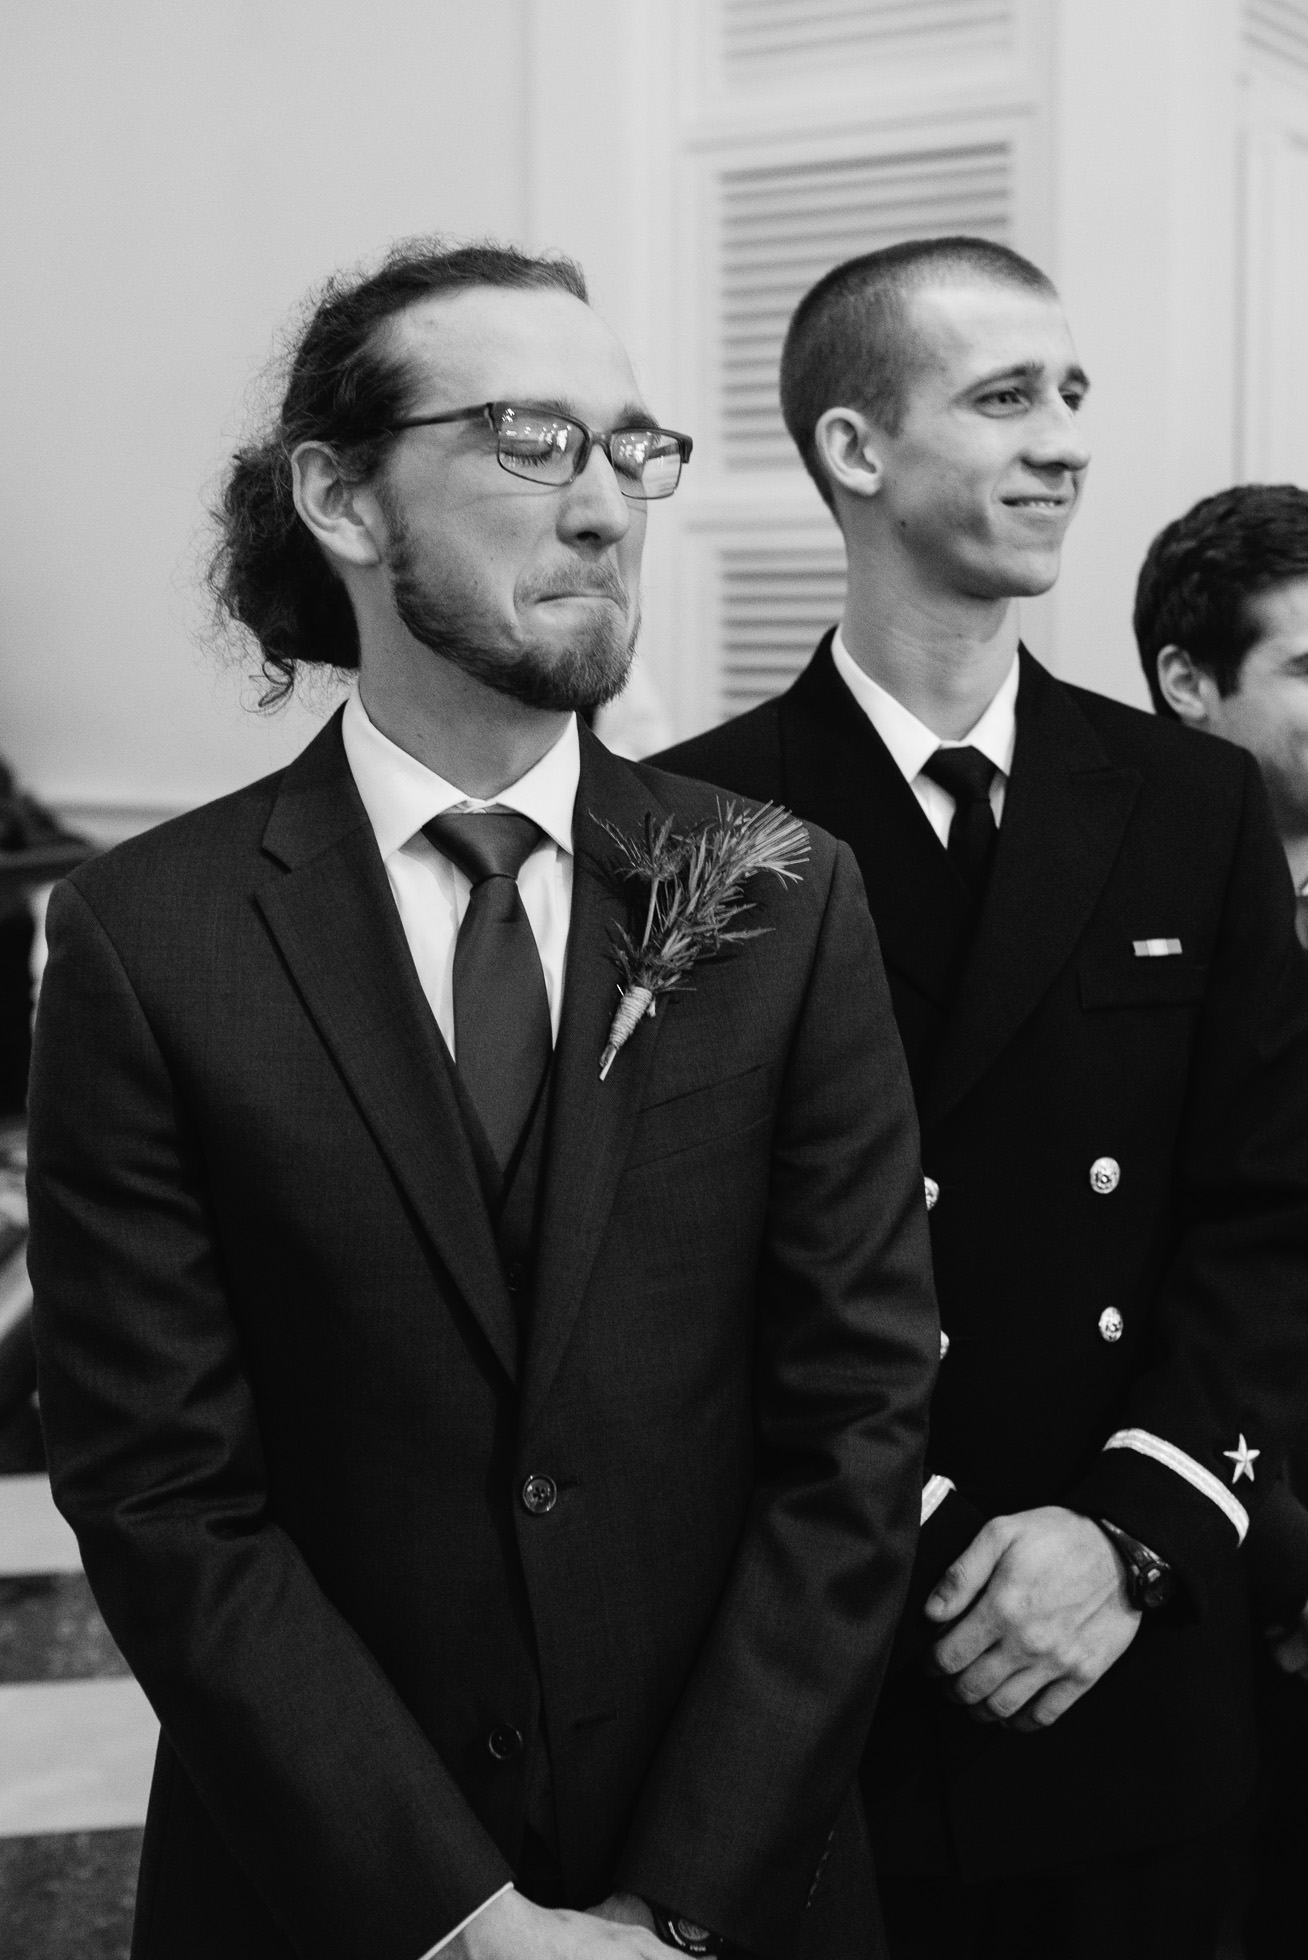 St. Michaels of the Valley Ligonier PA wedding, wedding photography-6405.jpg